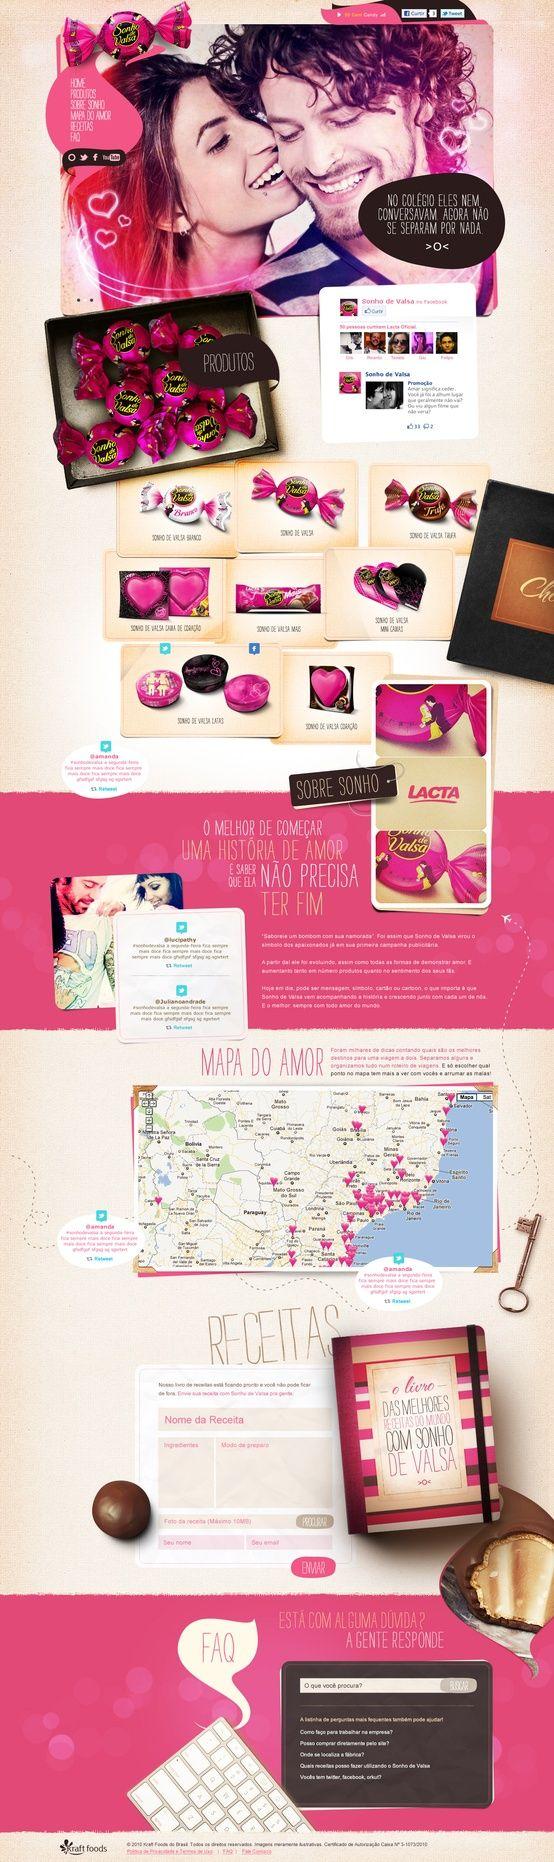 #Creative #webdesign with a splash of crazy #pink! | #webdesign #it #web #design #layout #userinterface #website #webdesign < repinned by www.BlickeDeeler.de | Take a look at www.WebsiteDesign-Hamburg.de